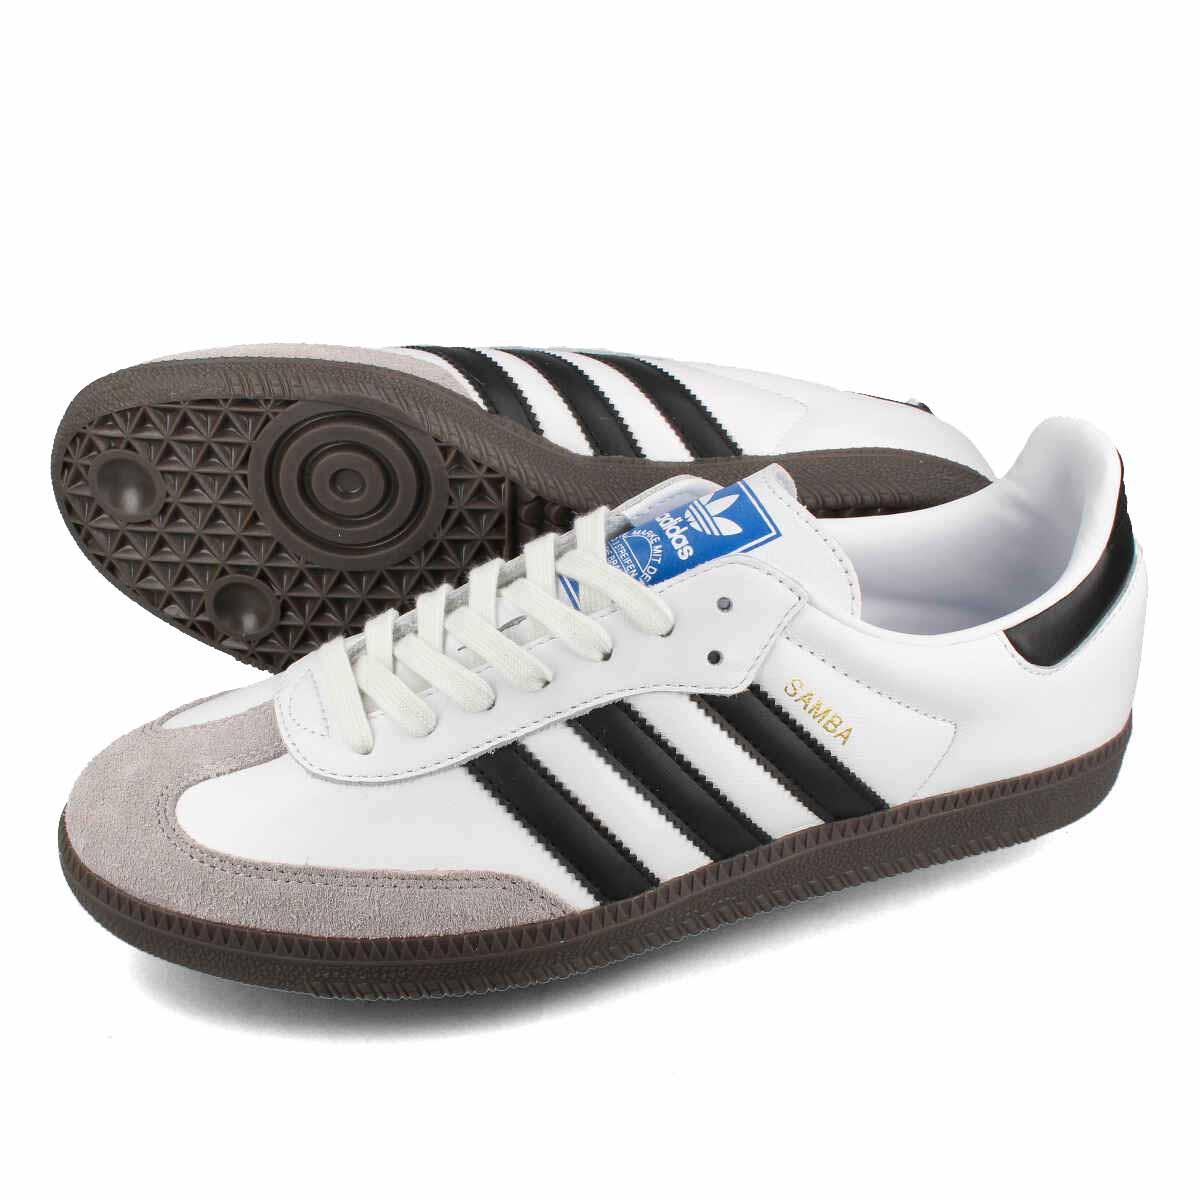 pretty nice d894b da389 adidas SAMBA OG Adidas samba OG RUNNING WHITE CORE BLACK CLEAR GRANITE